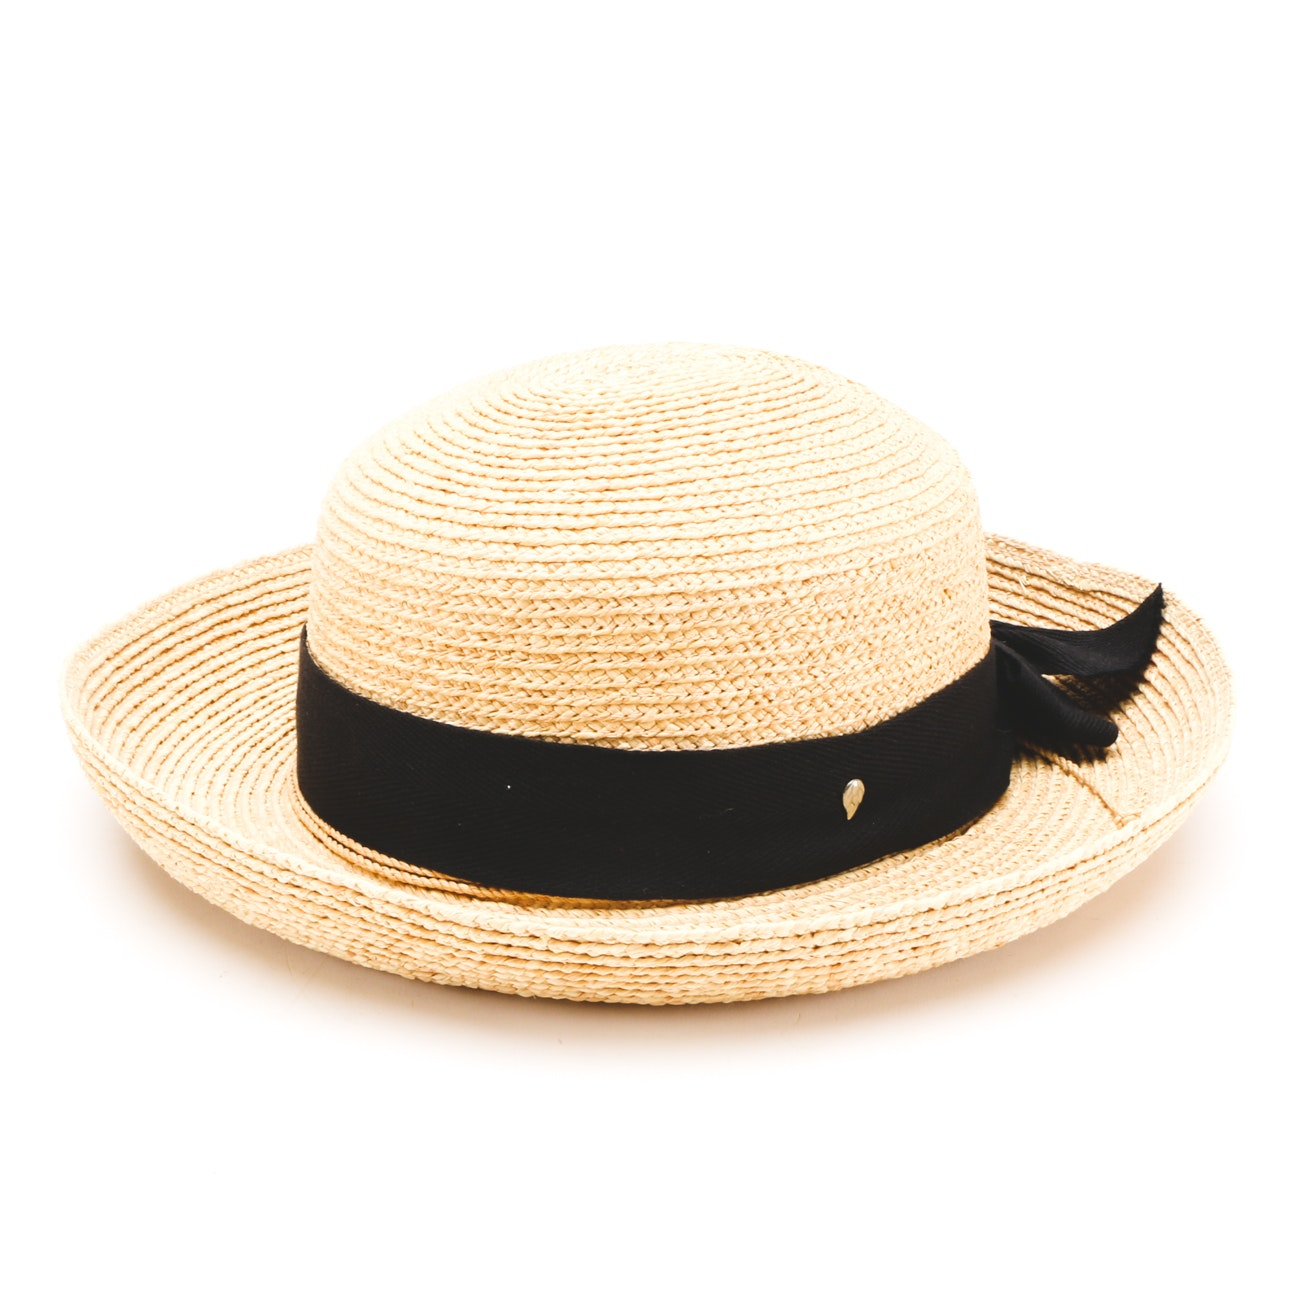 Helen Kaminski of Sydney, Australia Woven Raffia Hat